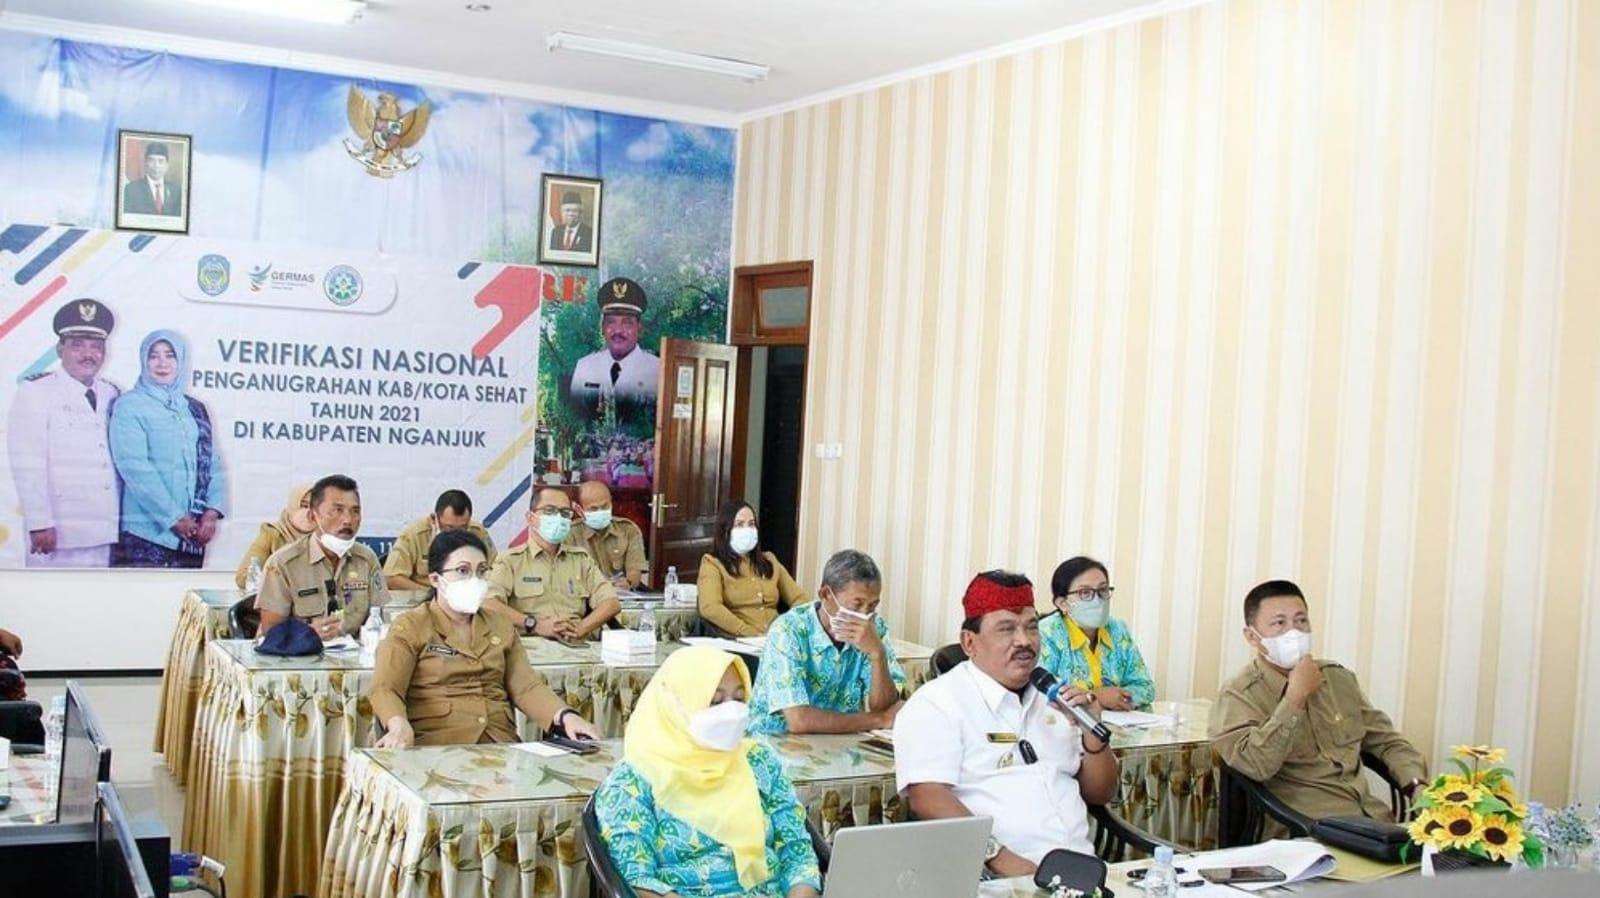 Penilaian KKS, Kabupaten Nganjuk Optimis Raih Swastisaba Wistara